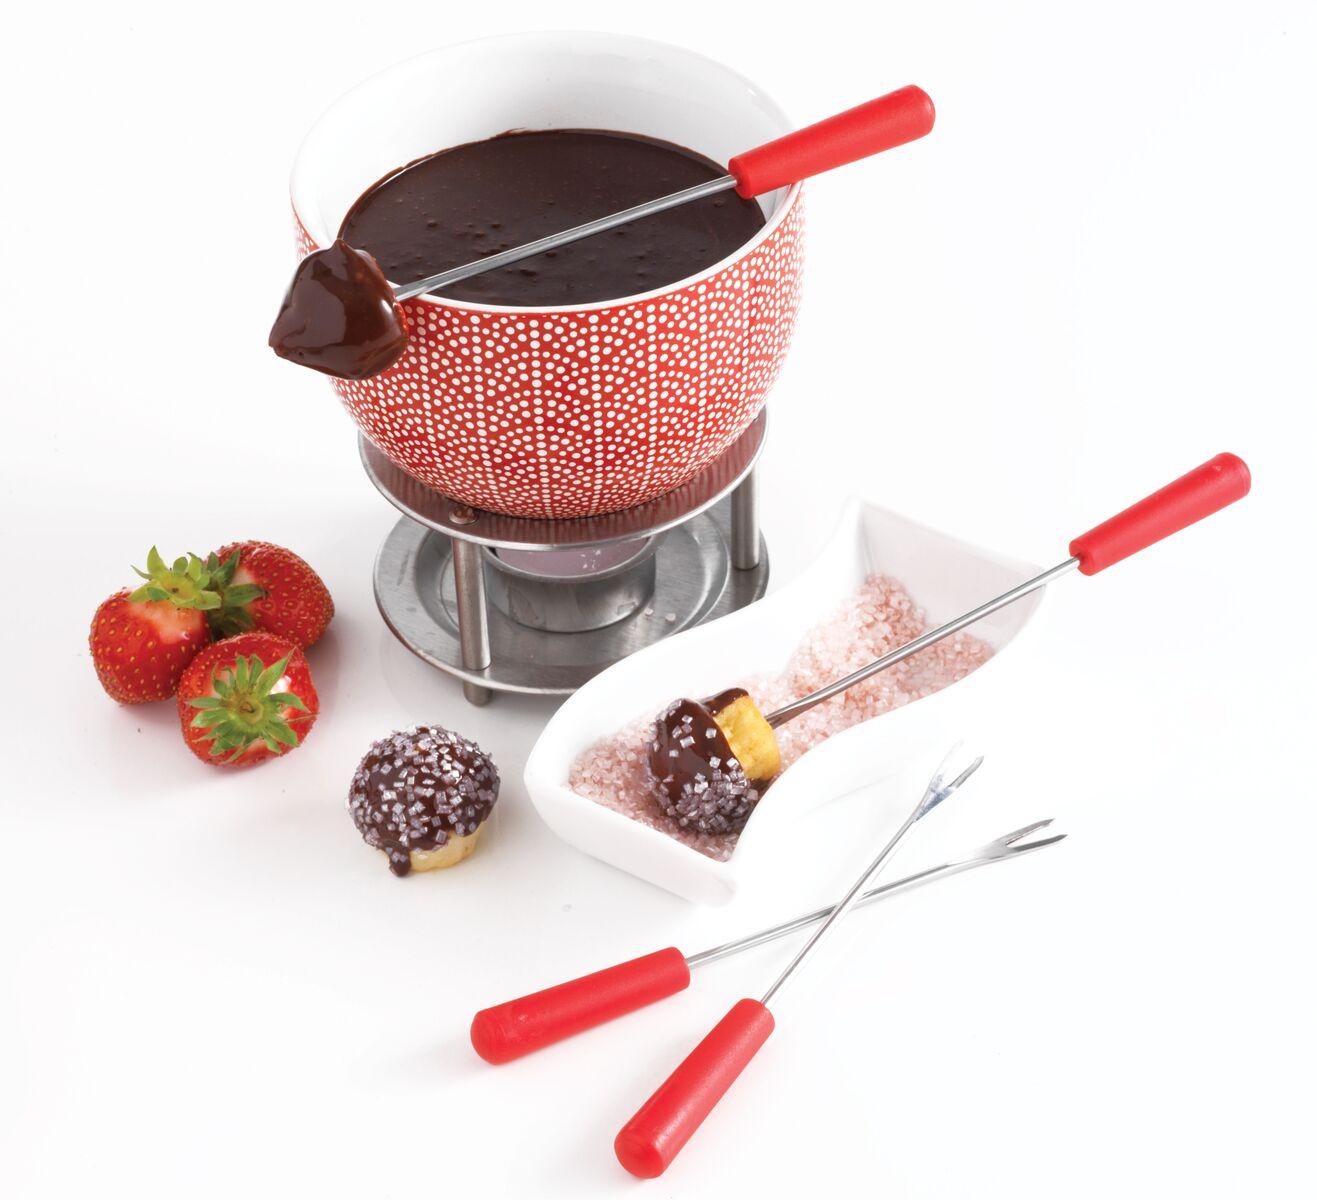 Chocolate Fondue Set - Stars